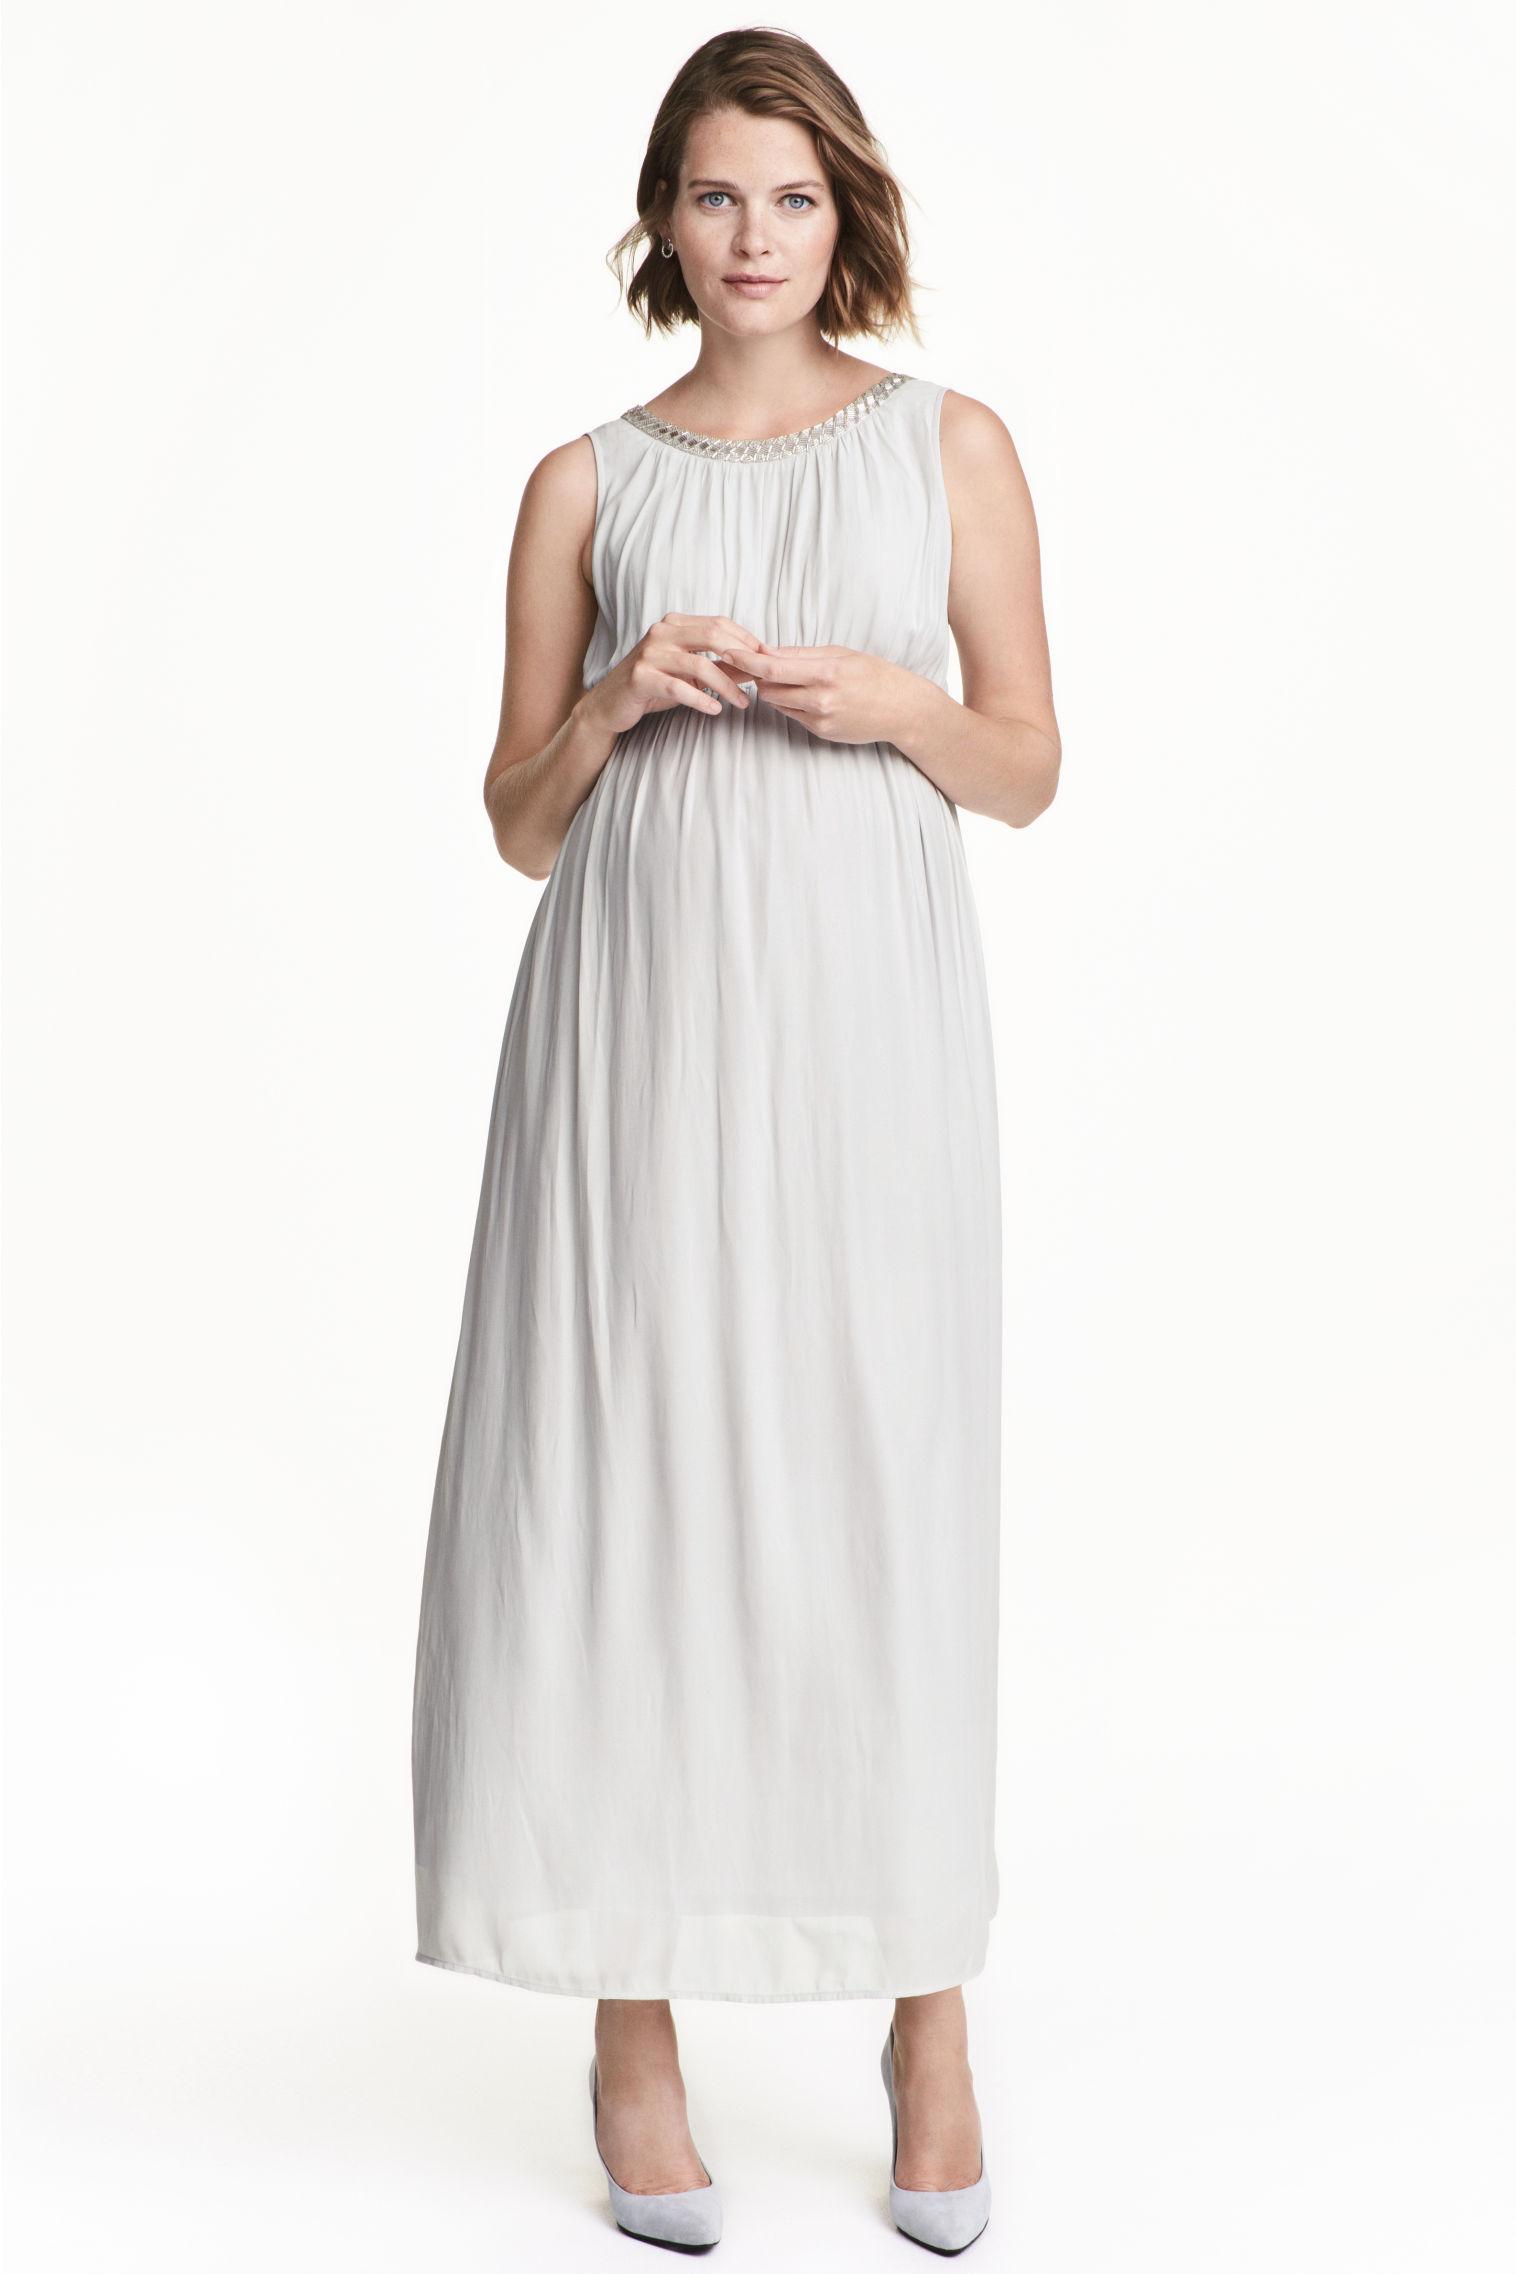 8 robes de grossesse qui sublimeront avec l gance vos. Black Bedroom Furniture Sets. Home Design Ideas